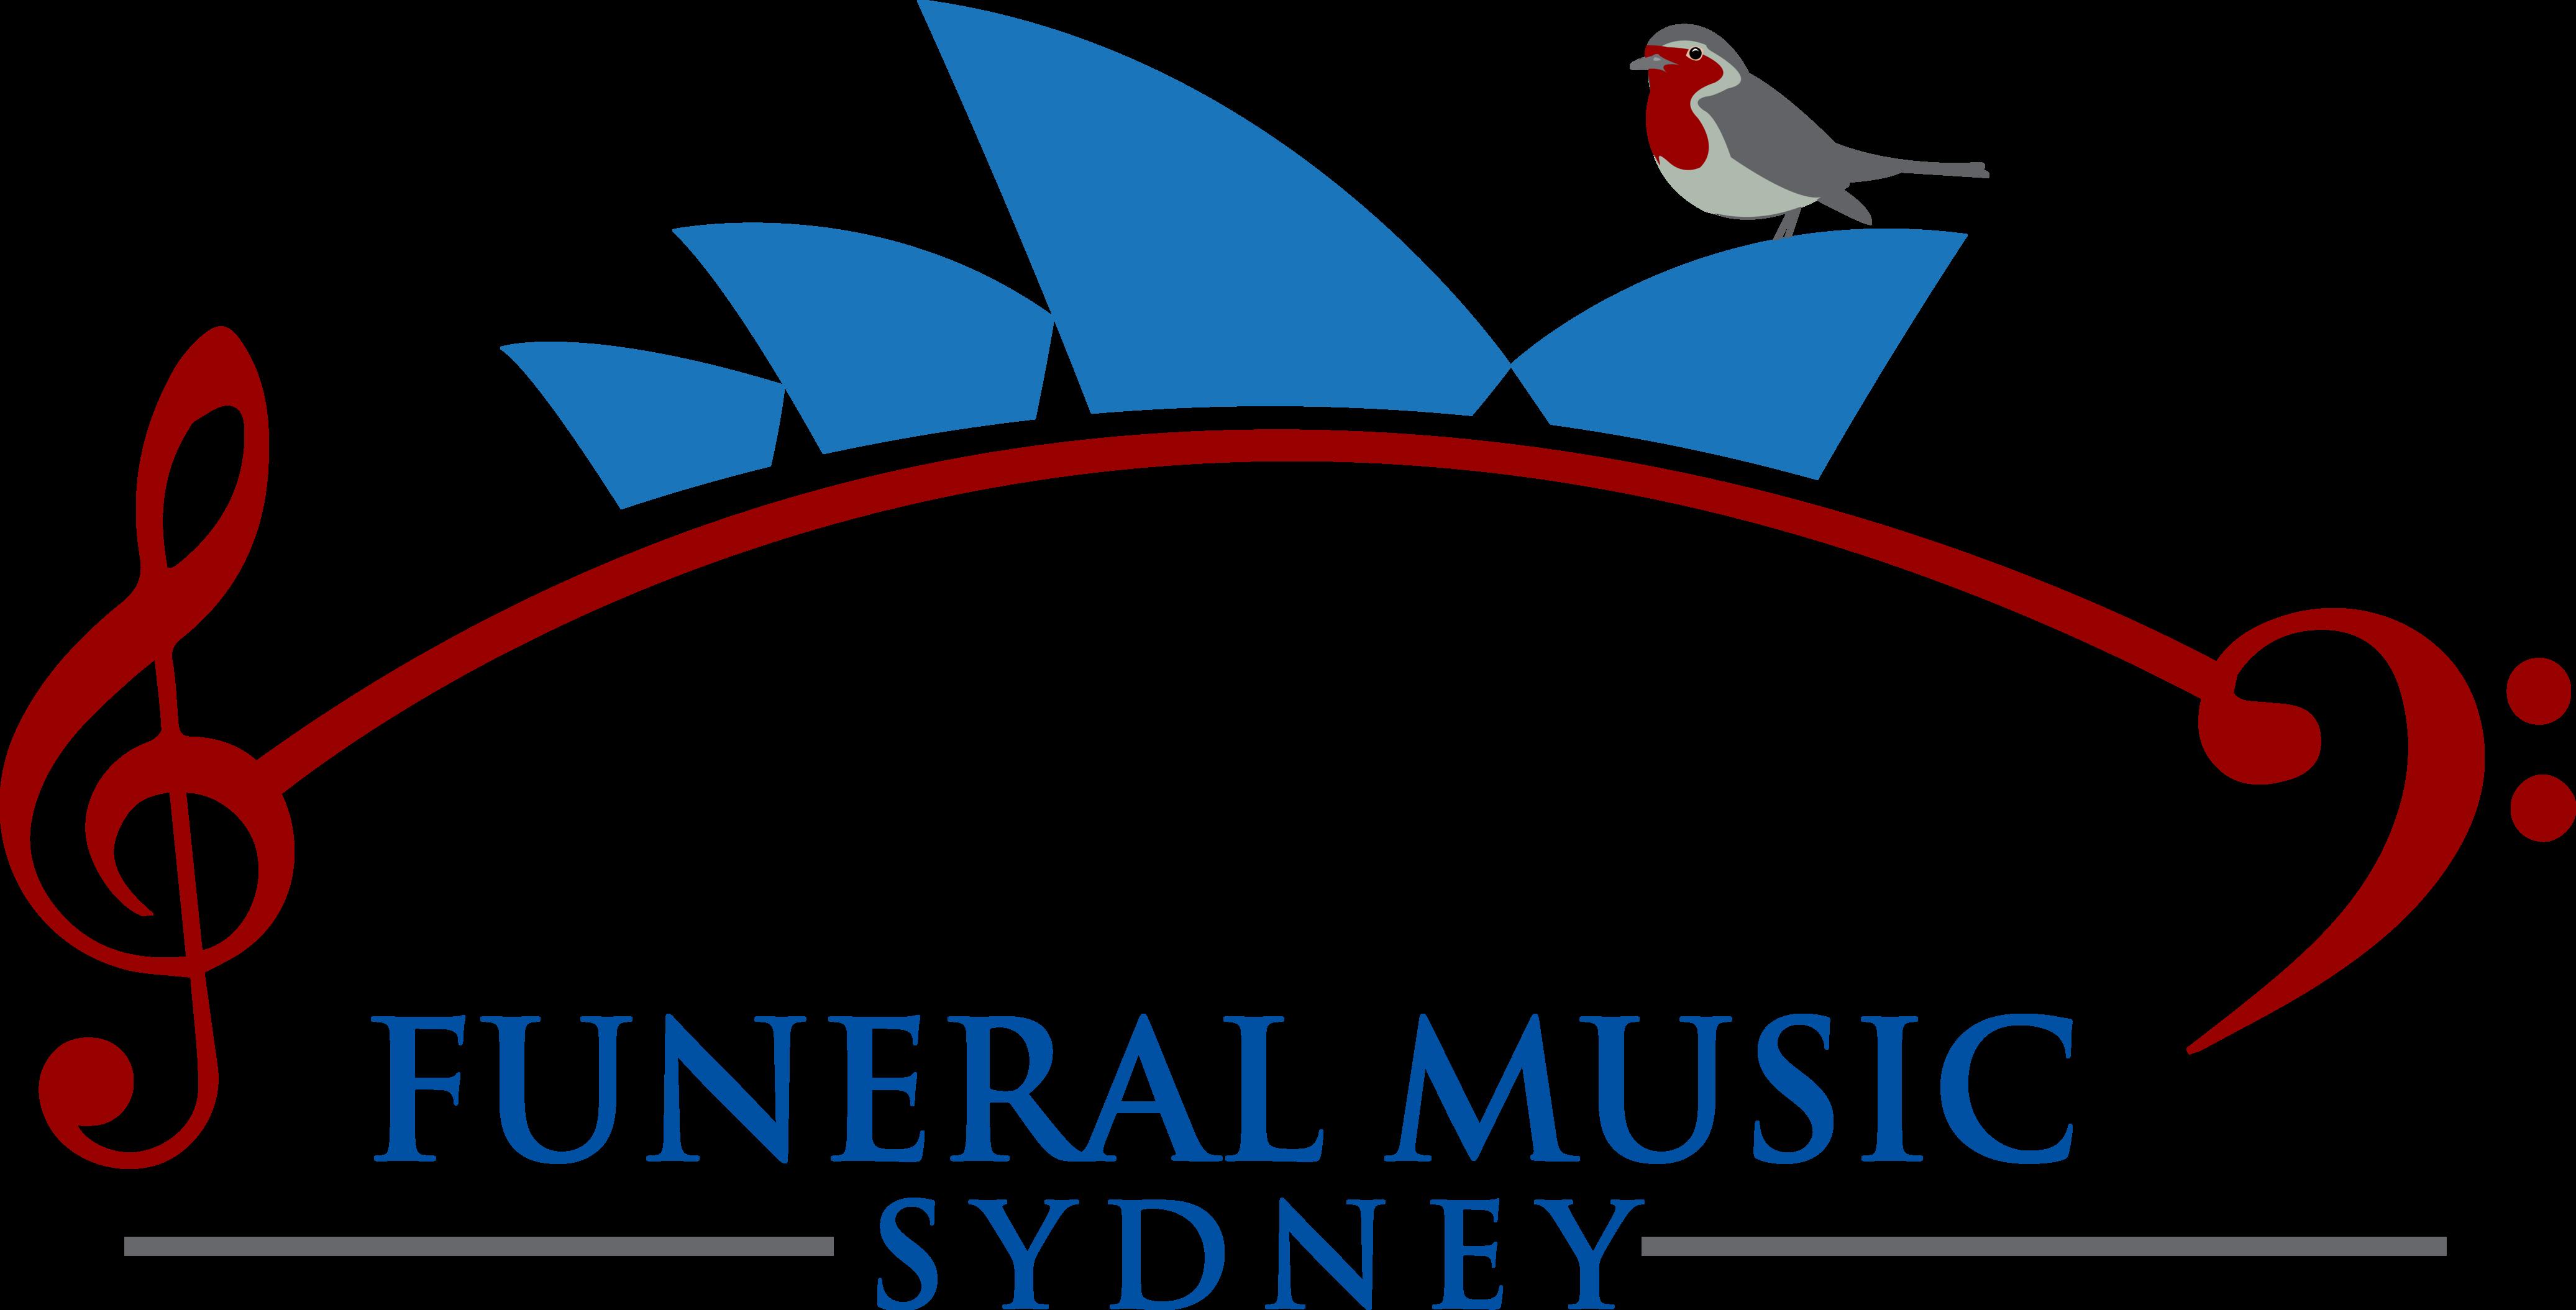 4146x2109 Religious Funeral Music Sydney